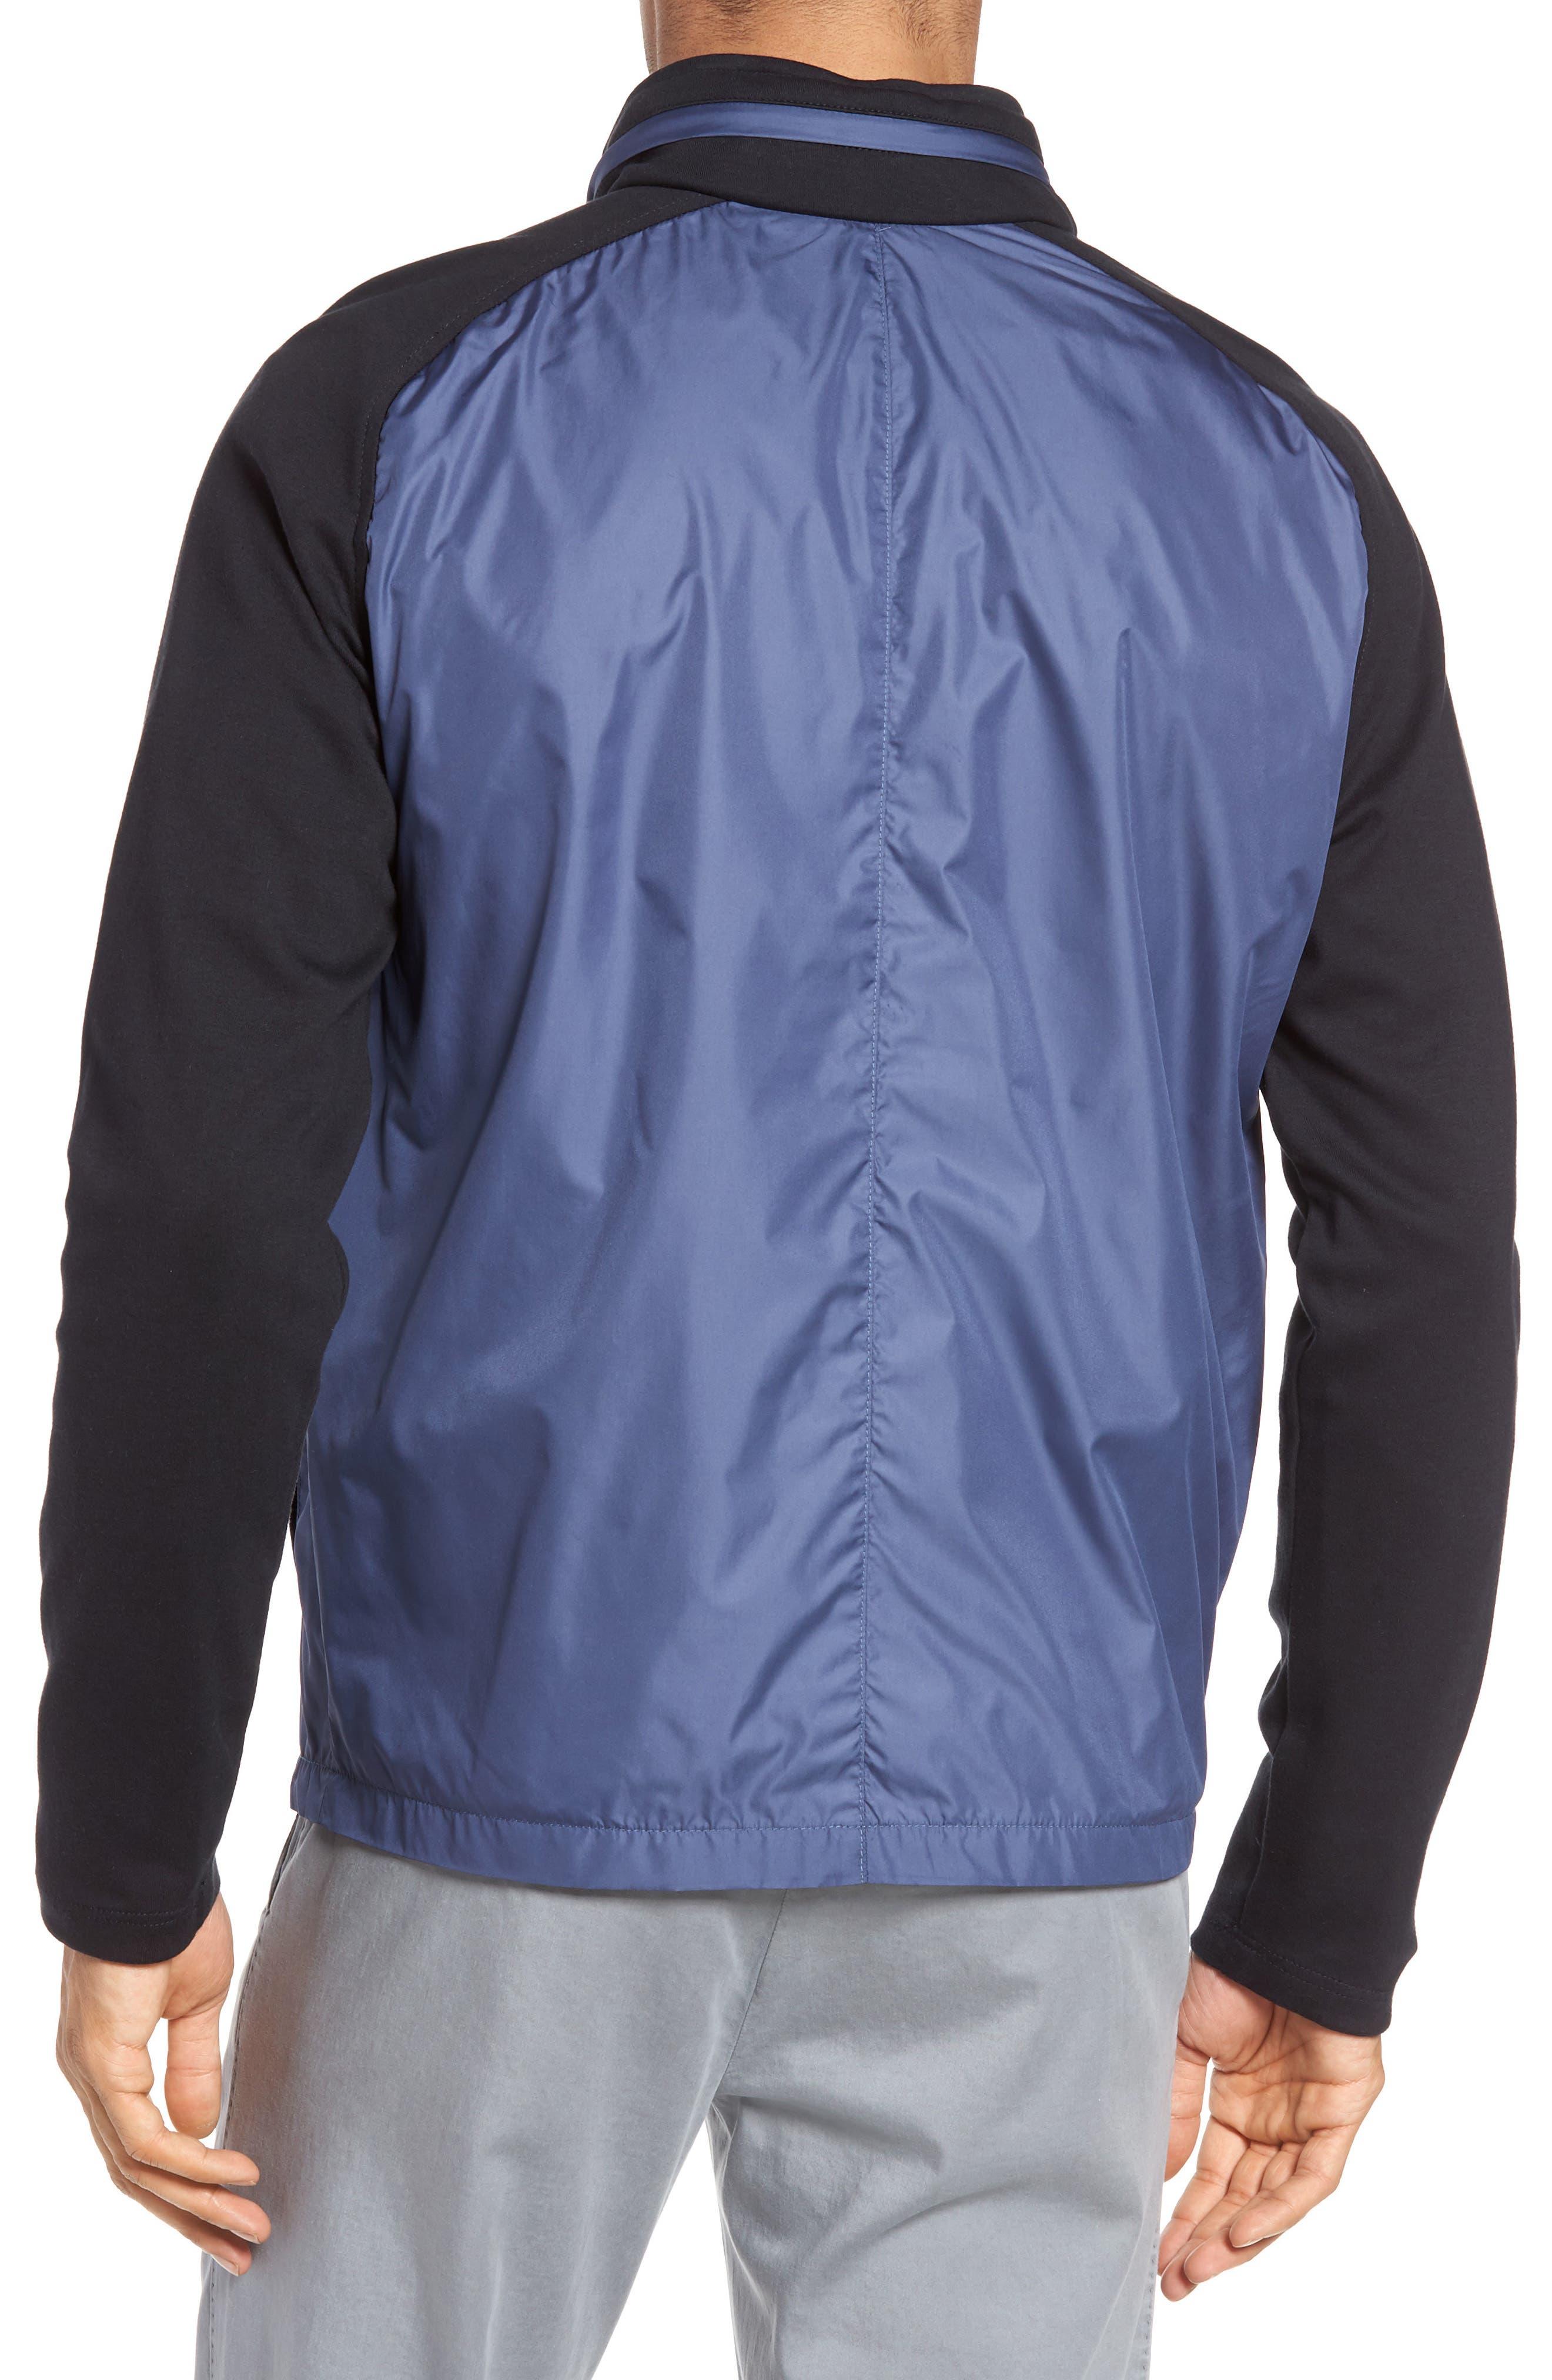 Syconium Mixed Media Zip Front Jacket,                             Alternate thumbnail 2, color,                             400